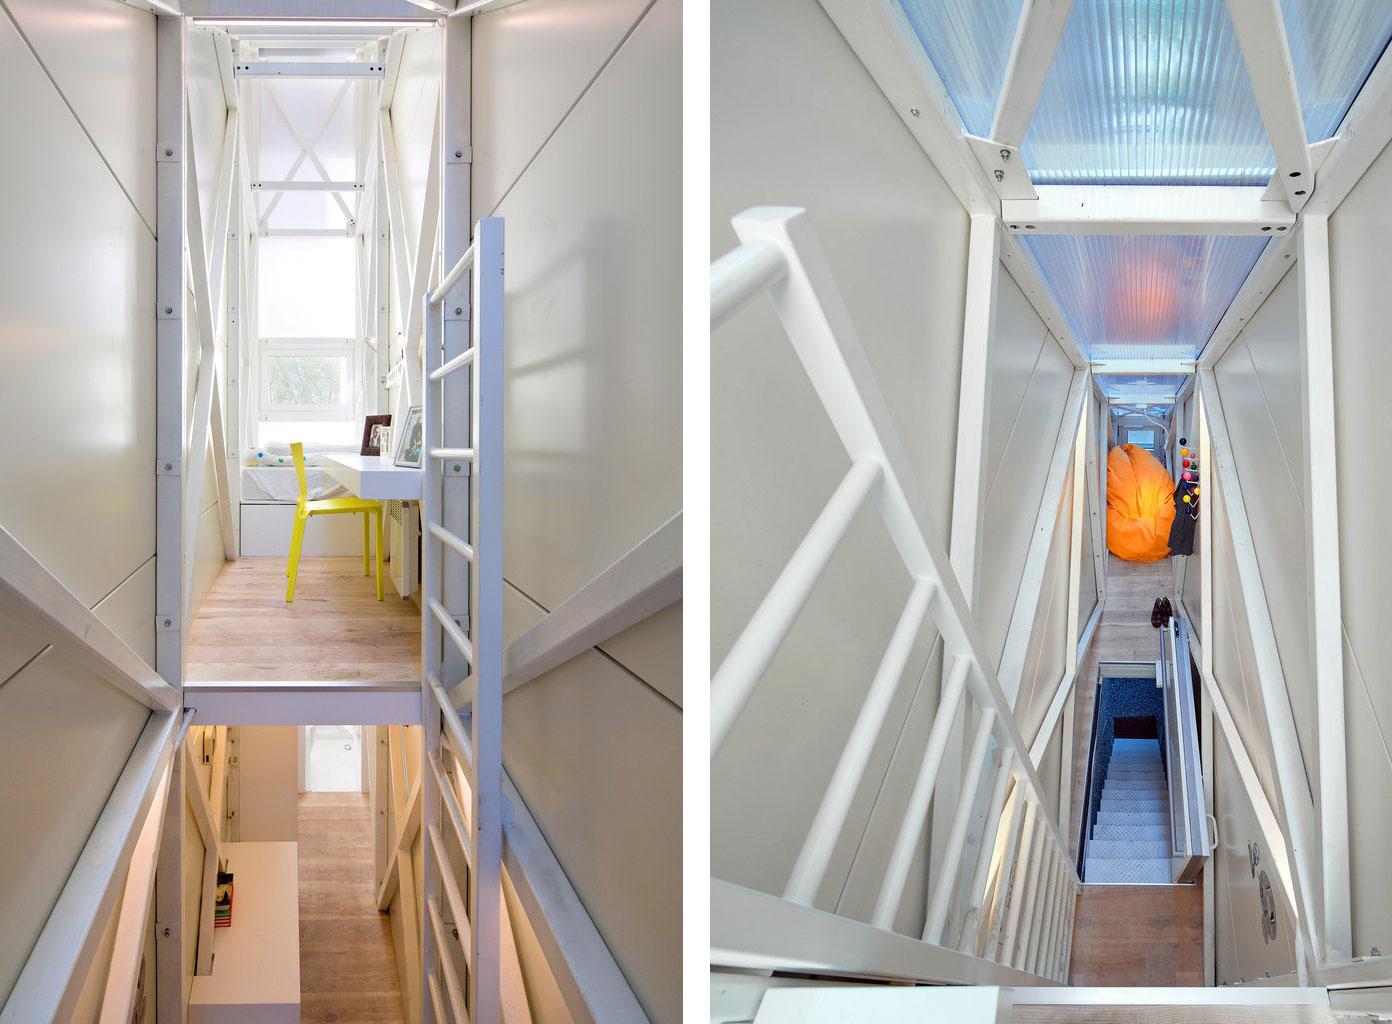 diaforetiko.gr : keret house1 Το στενότερο σπίτι στον κόσμο έχει πλάτος περίπου ένα μέτρο αλλά χωρά τα πάντα!